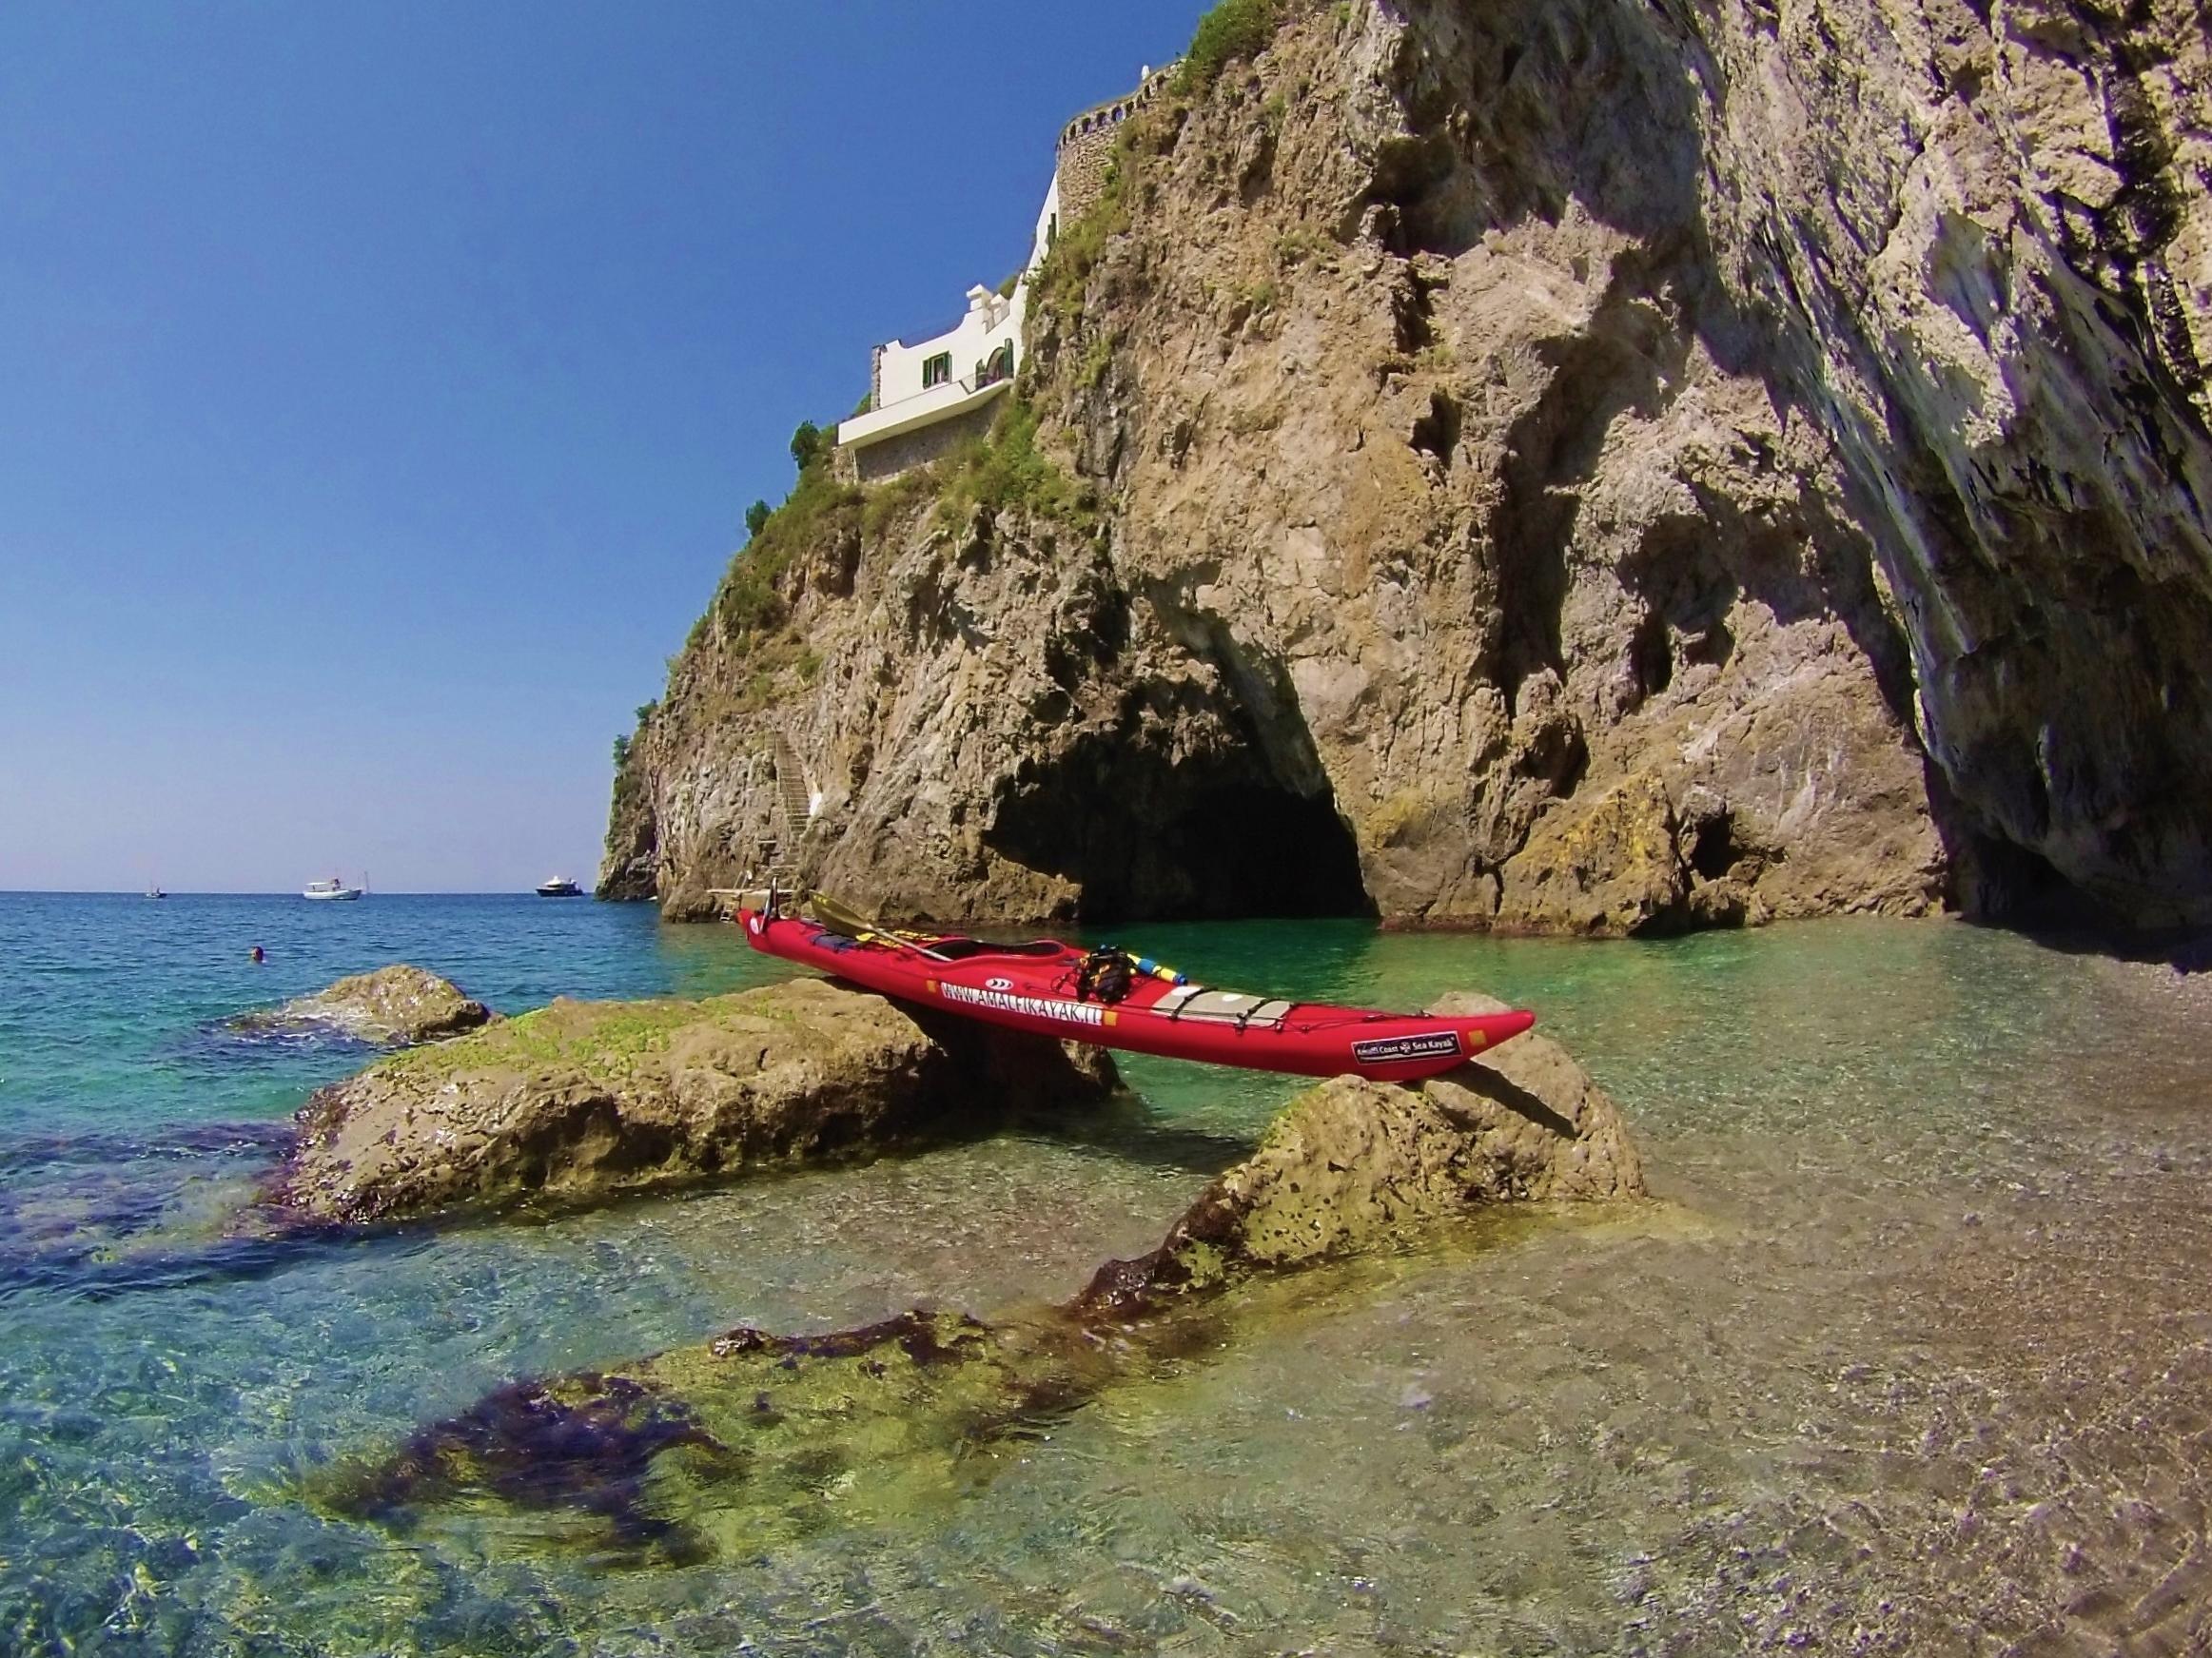 Ruochetiello Grotto - Amalfi Kayak